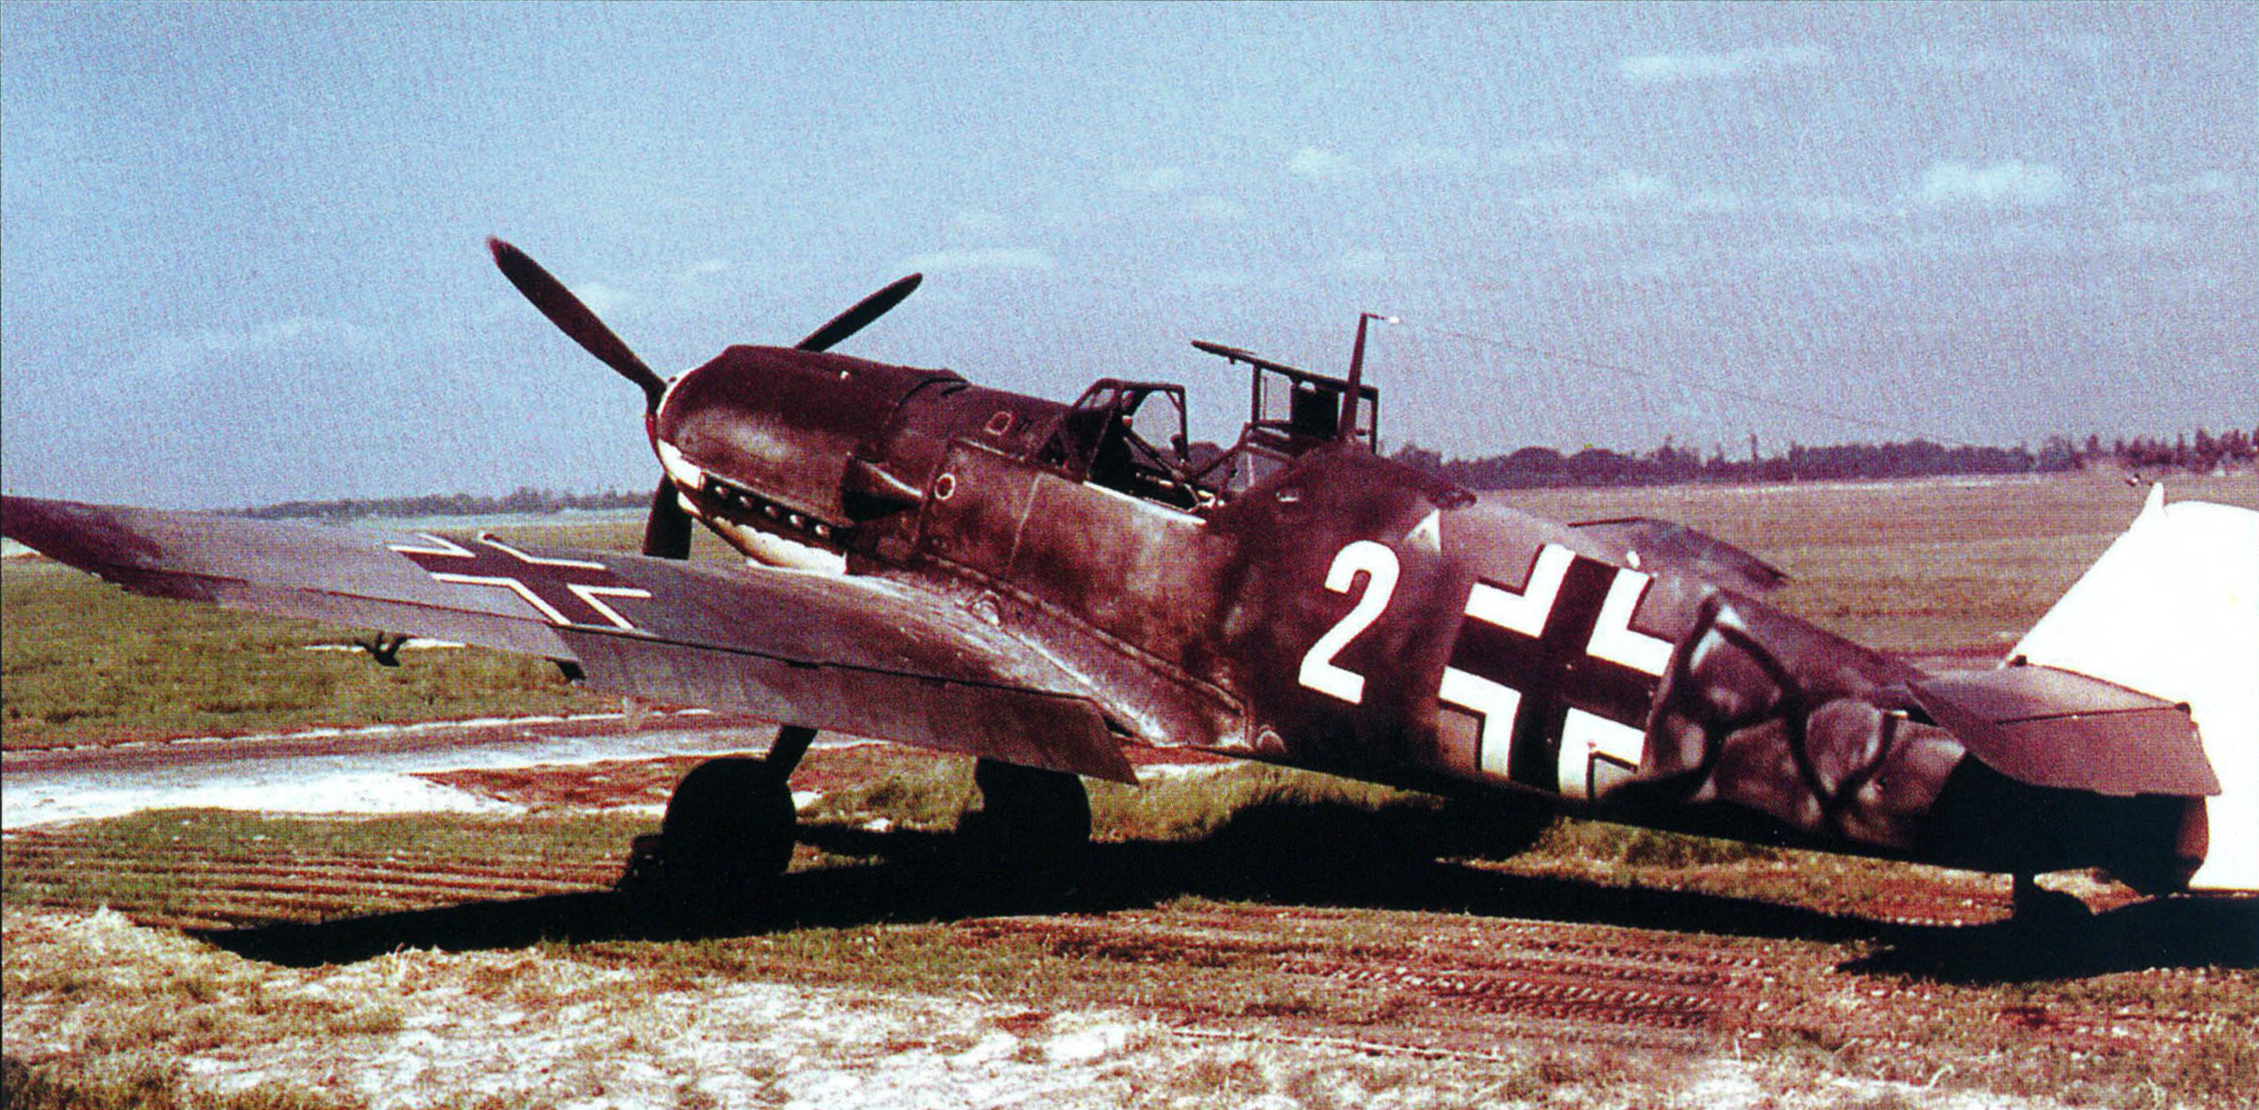 Airfix ME 109 1/72 - Tatzelwurm - FINISHED! - Page 2 Bf-109E-White-2-of-unknown-unit-Gratz-Apr-1941